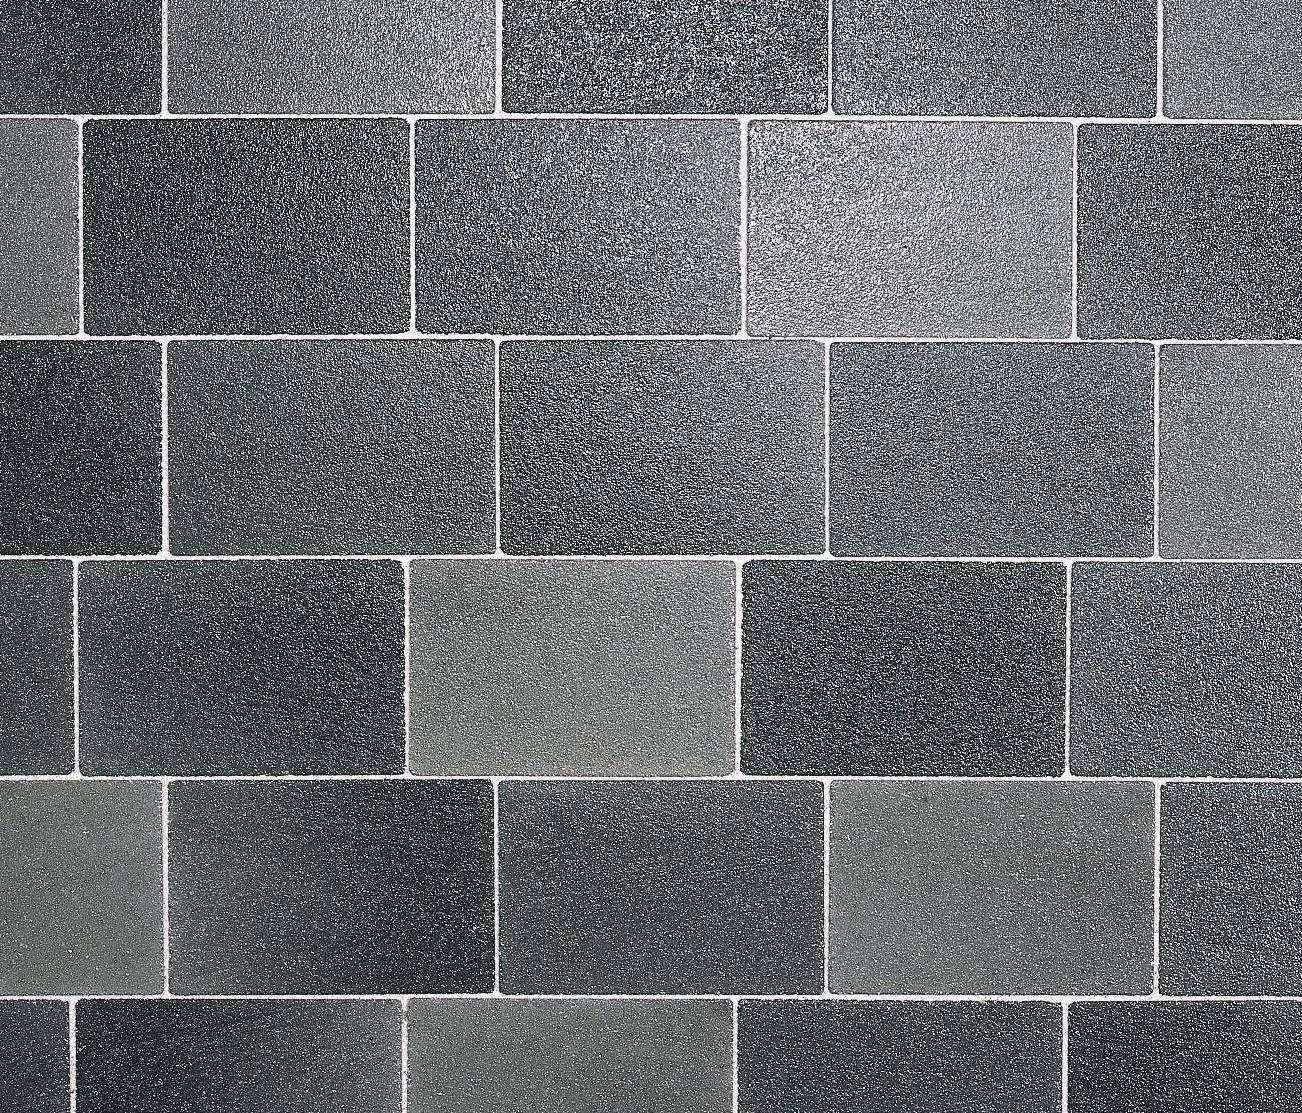 Metten Overath belpasso premio nuvola brillant nuancierend paving stones from